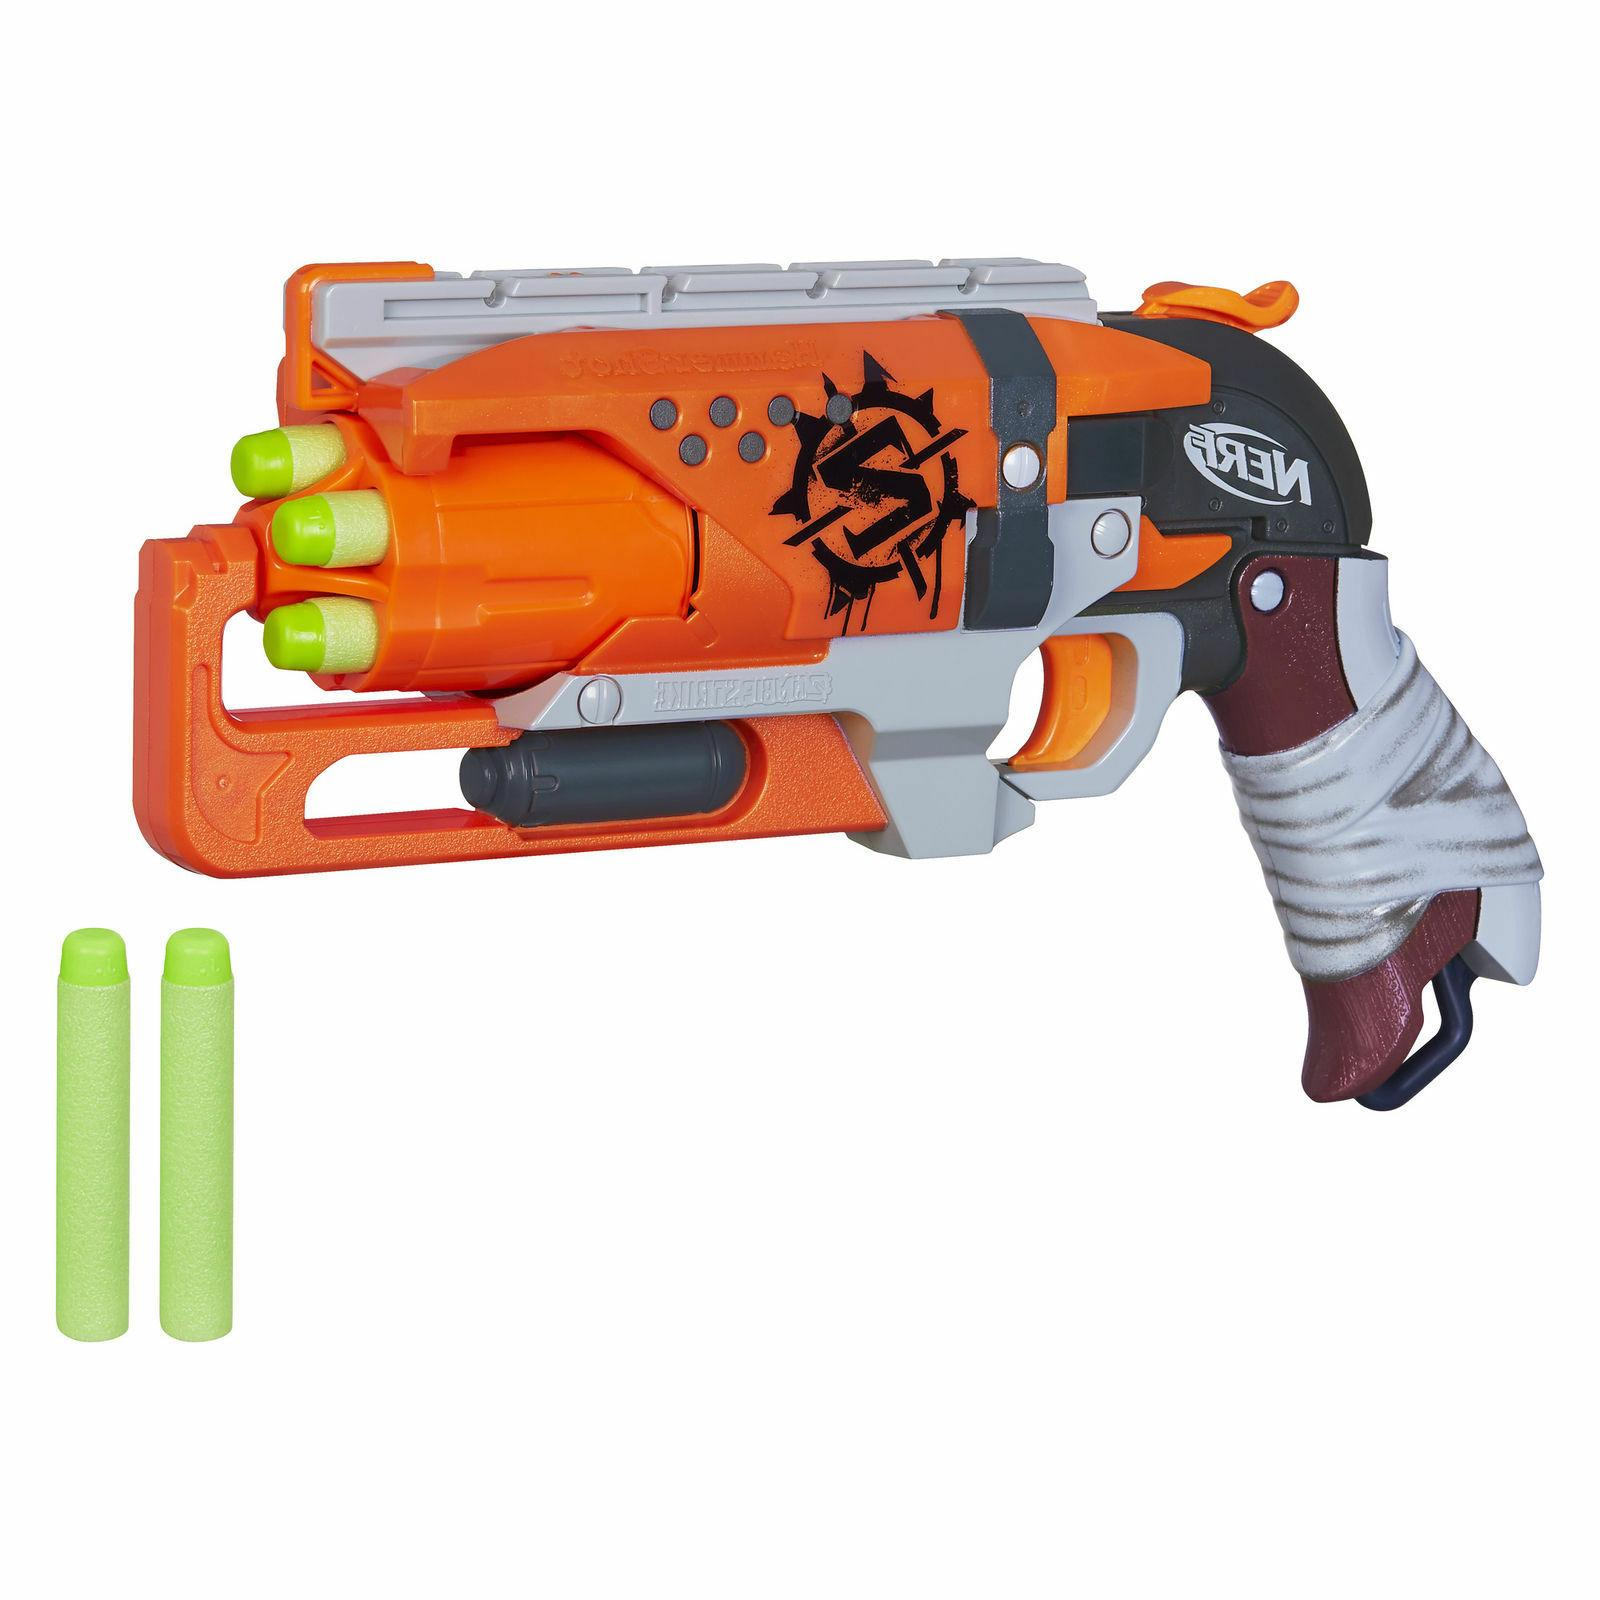 Nerf Blaster Gun